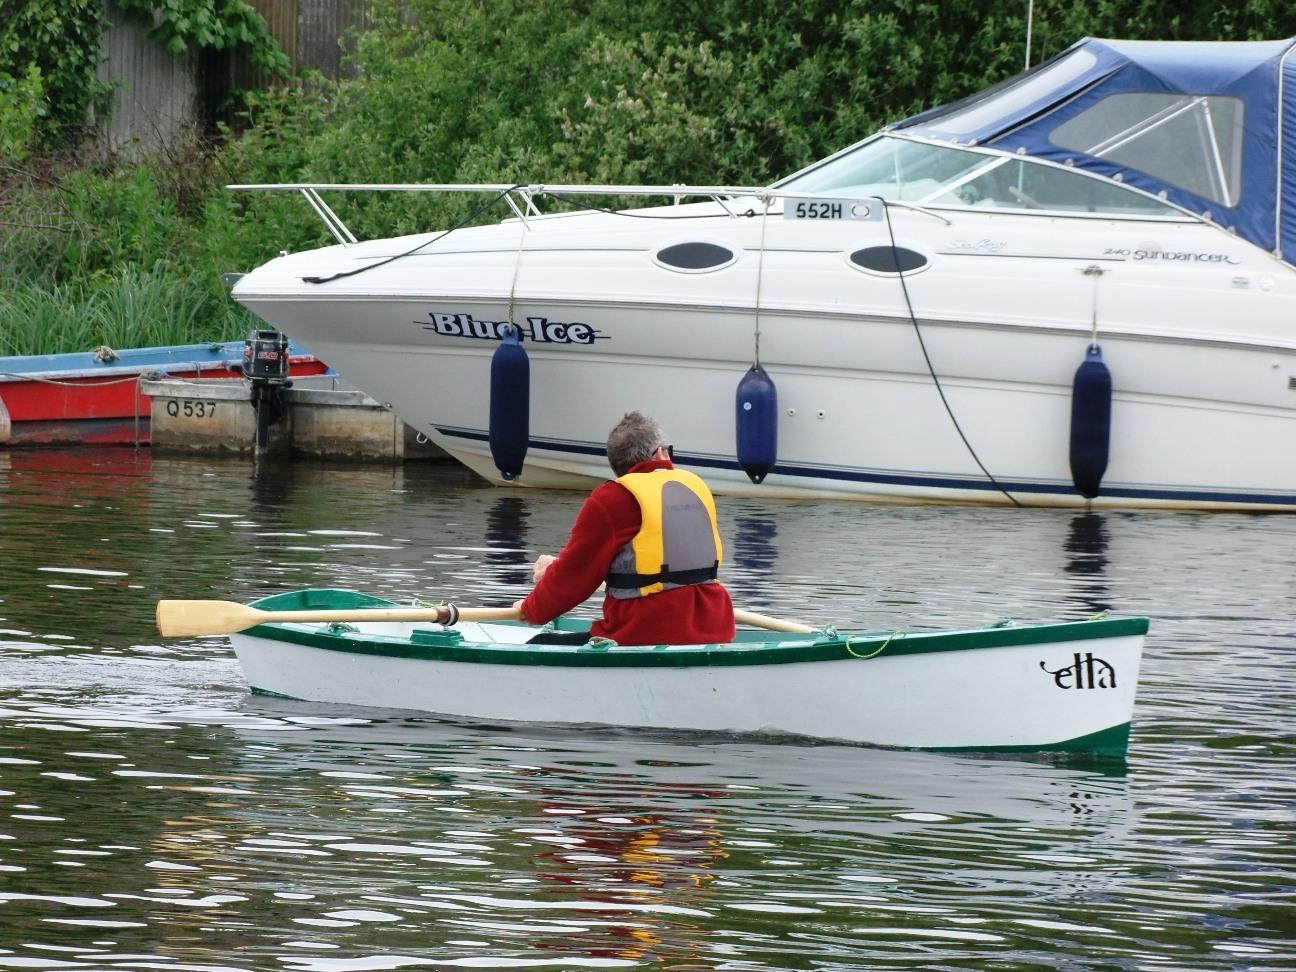 ... skiff, norman fuller, electric boat, electric skiff, rowing skiff